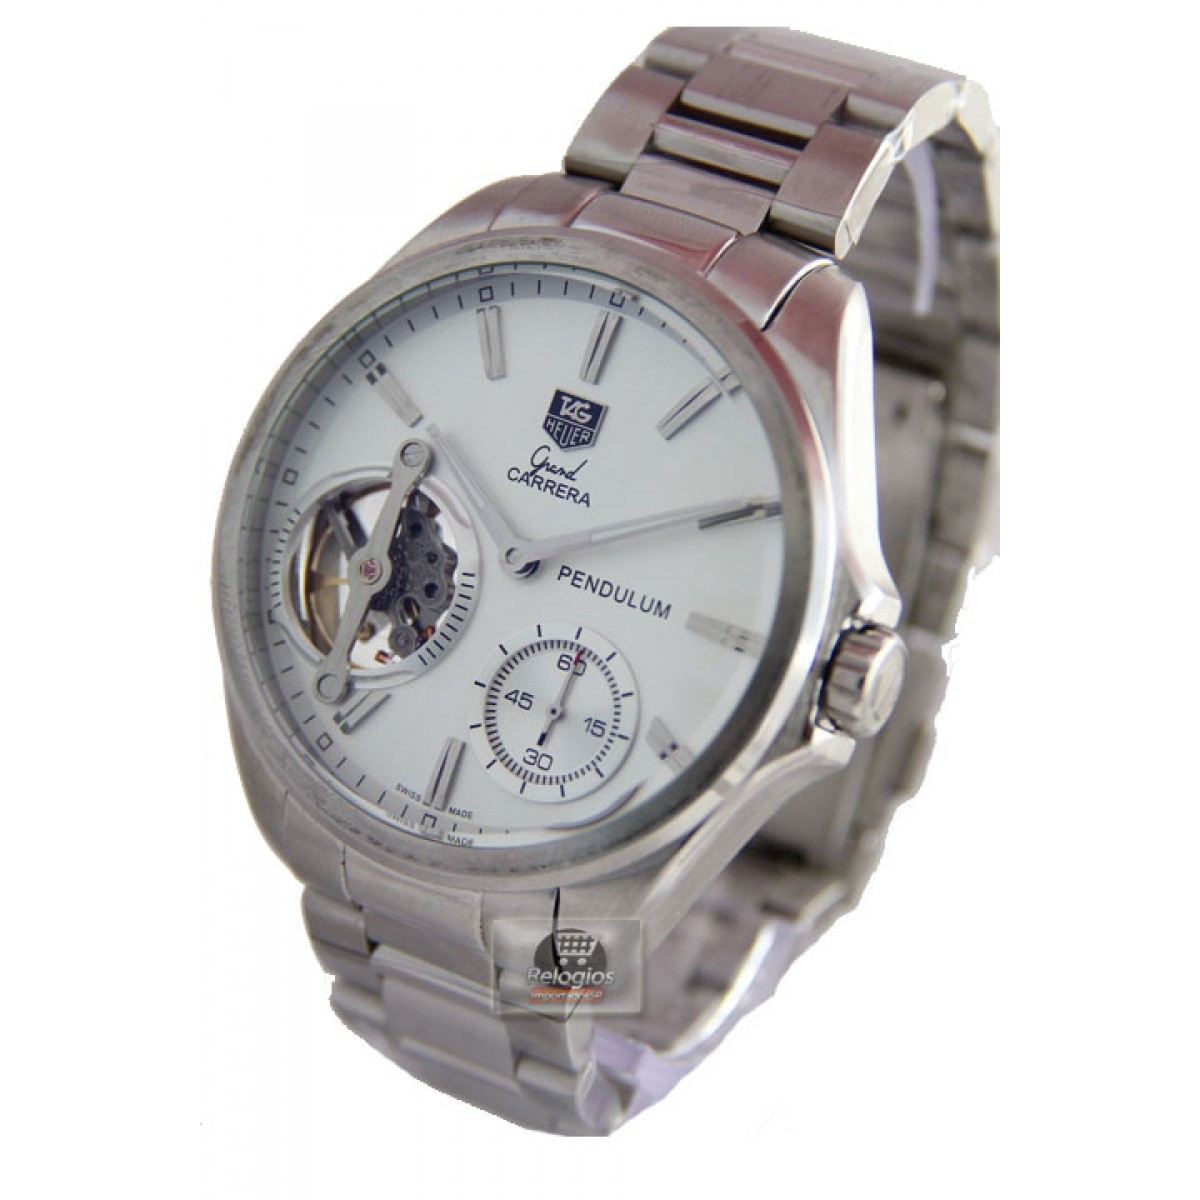 0d42de93b06 Relógio Réplica Tag Heuer Grand Carrera Pendulum